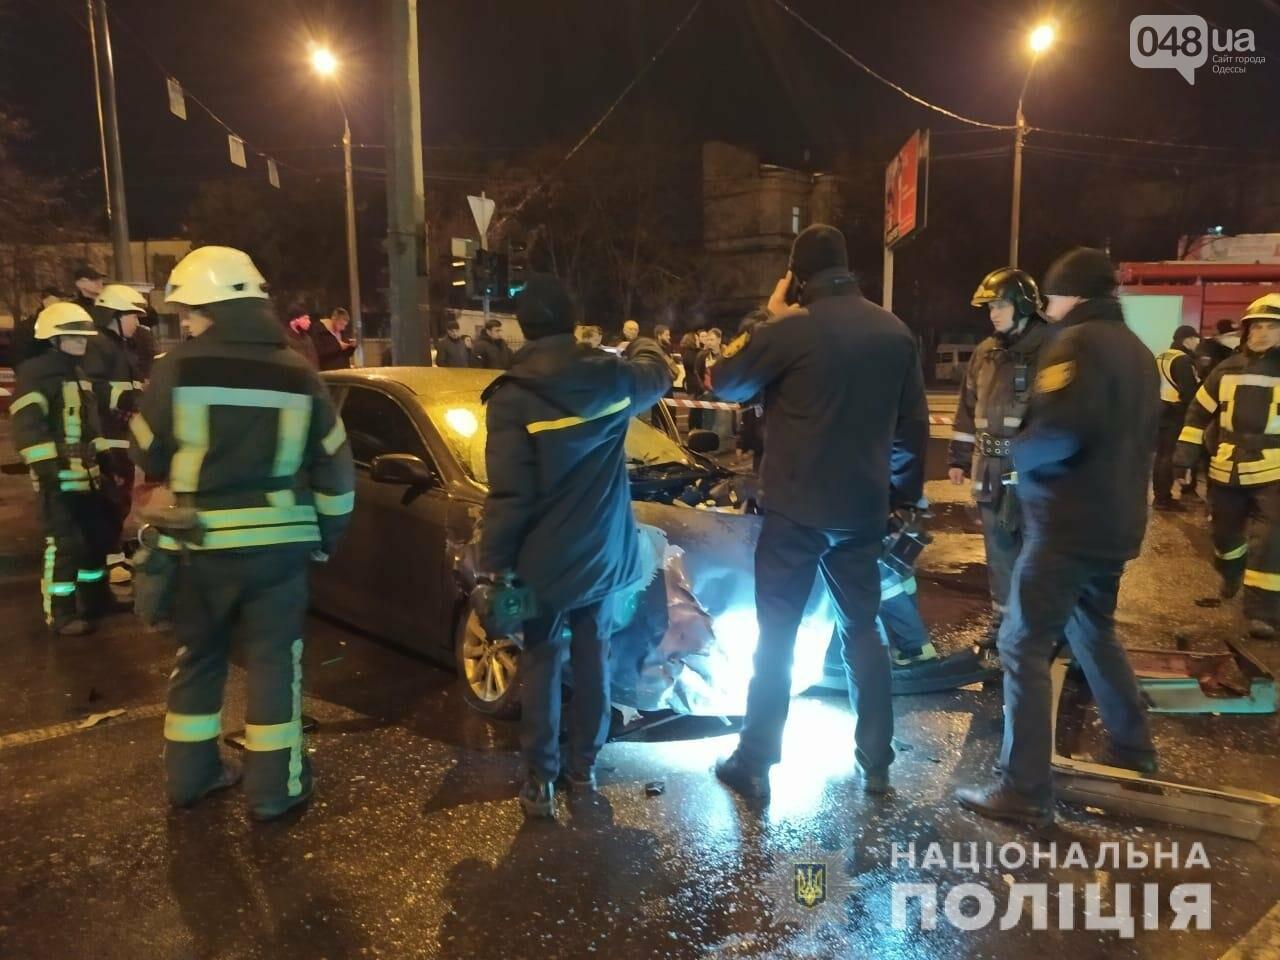 В Одессе в ночном ДТП погибли два человека, - ФОТО, ВИДЕО,..., фото-44